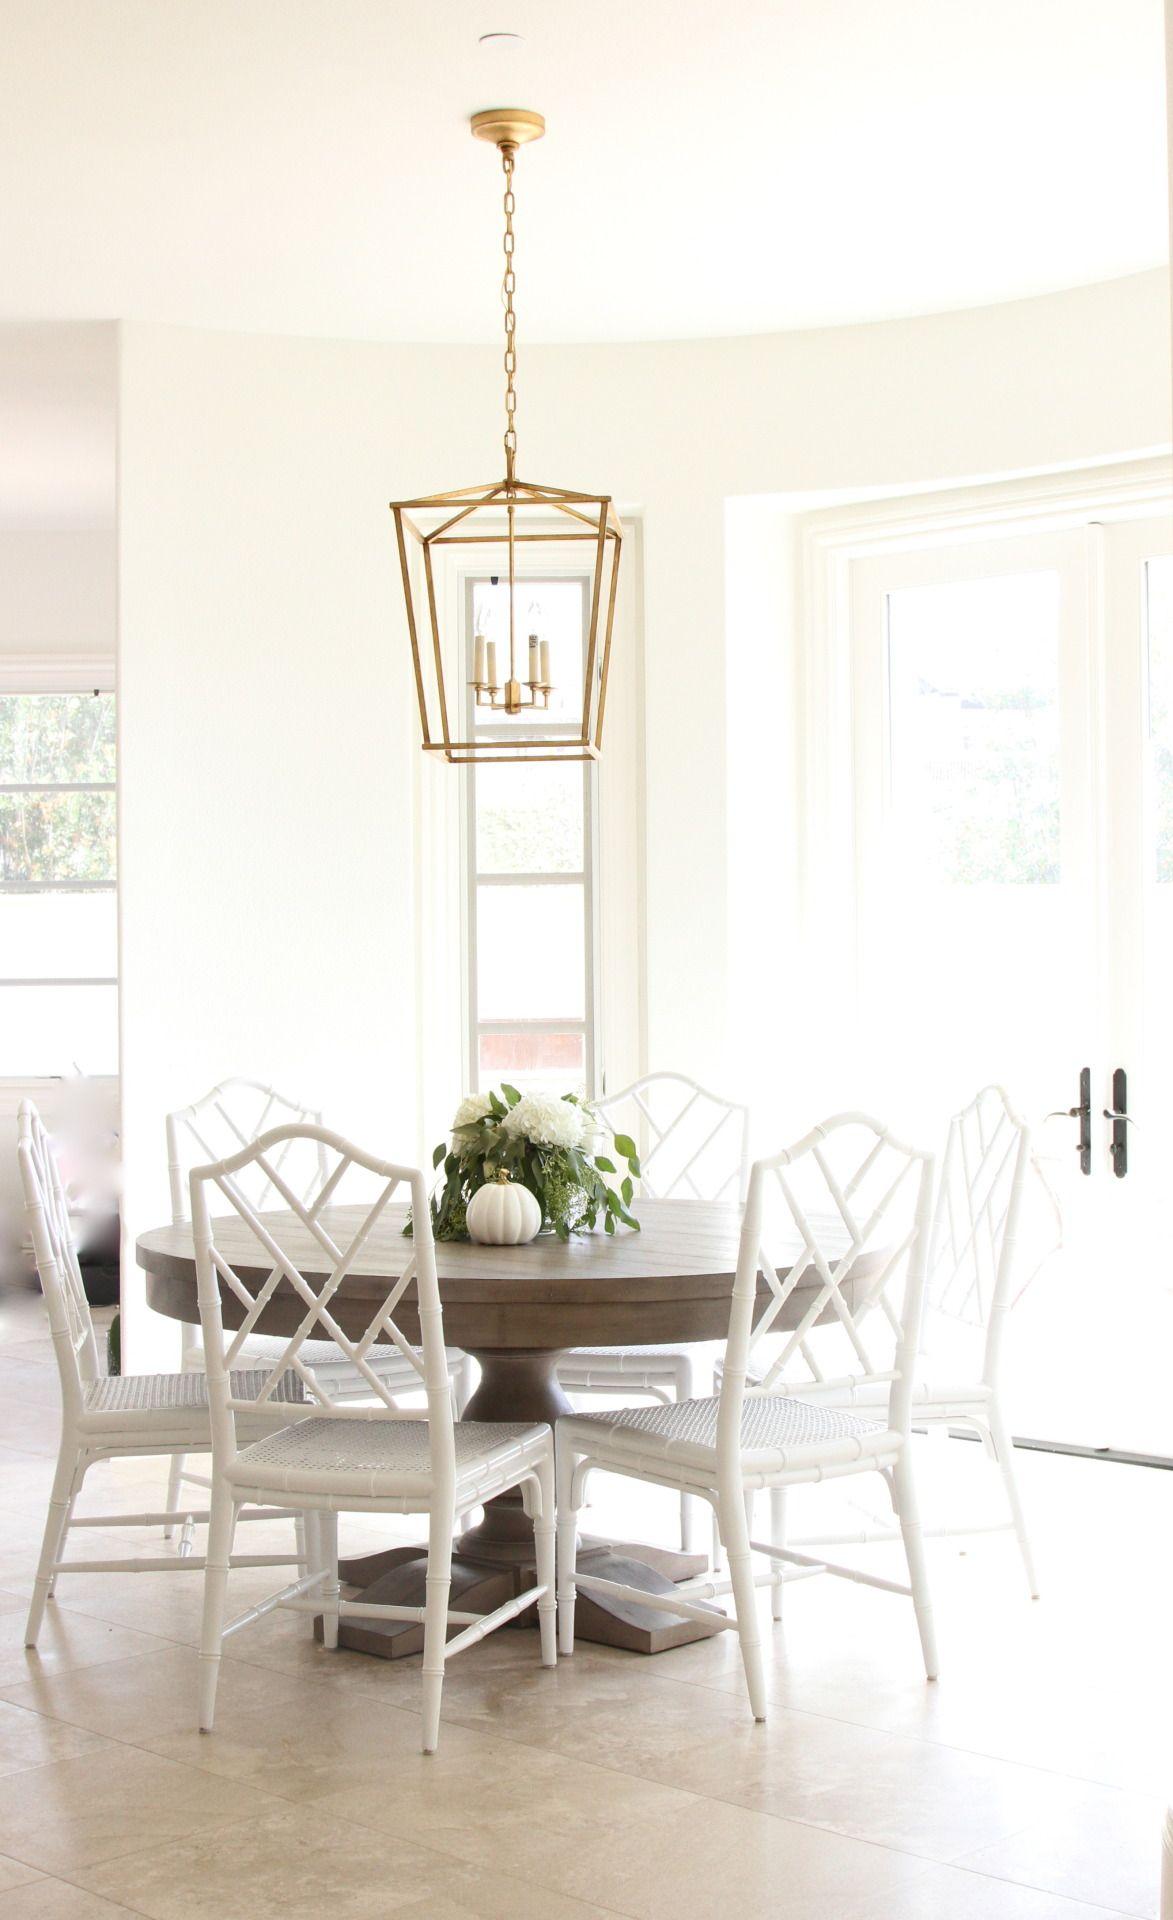 Dining Space With Gold Lantern Light Fixture Ballard Designs